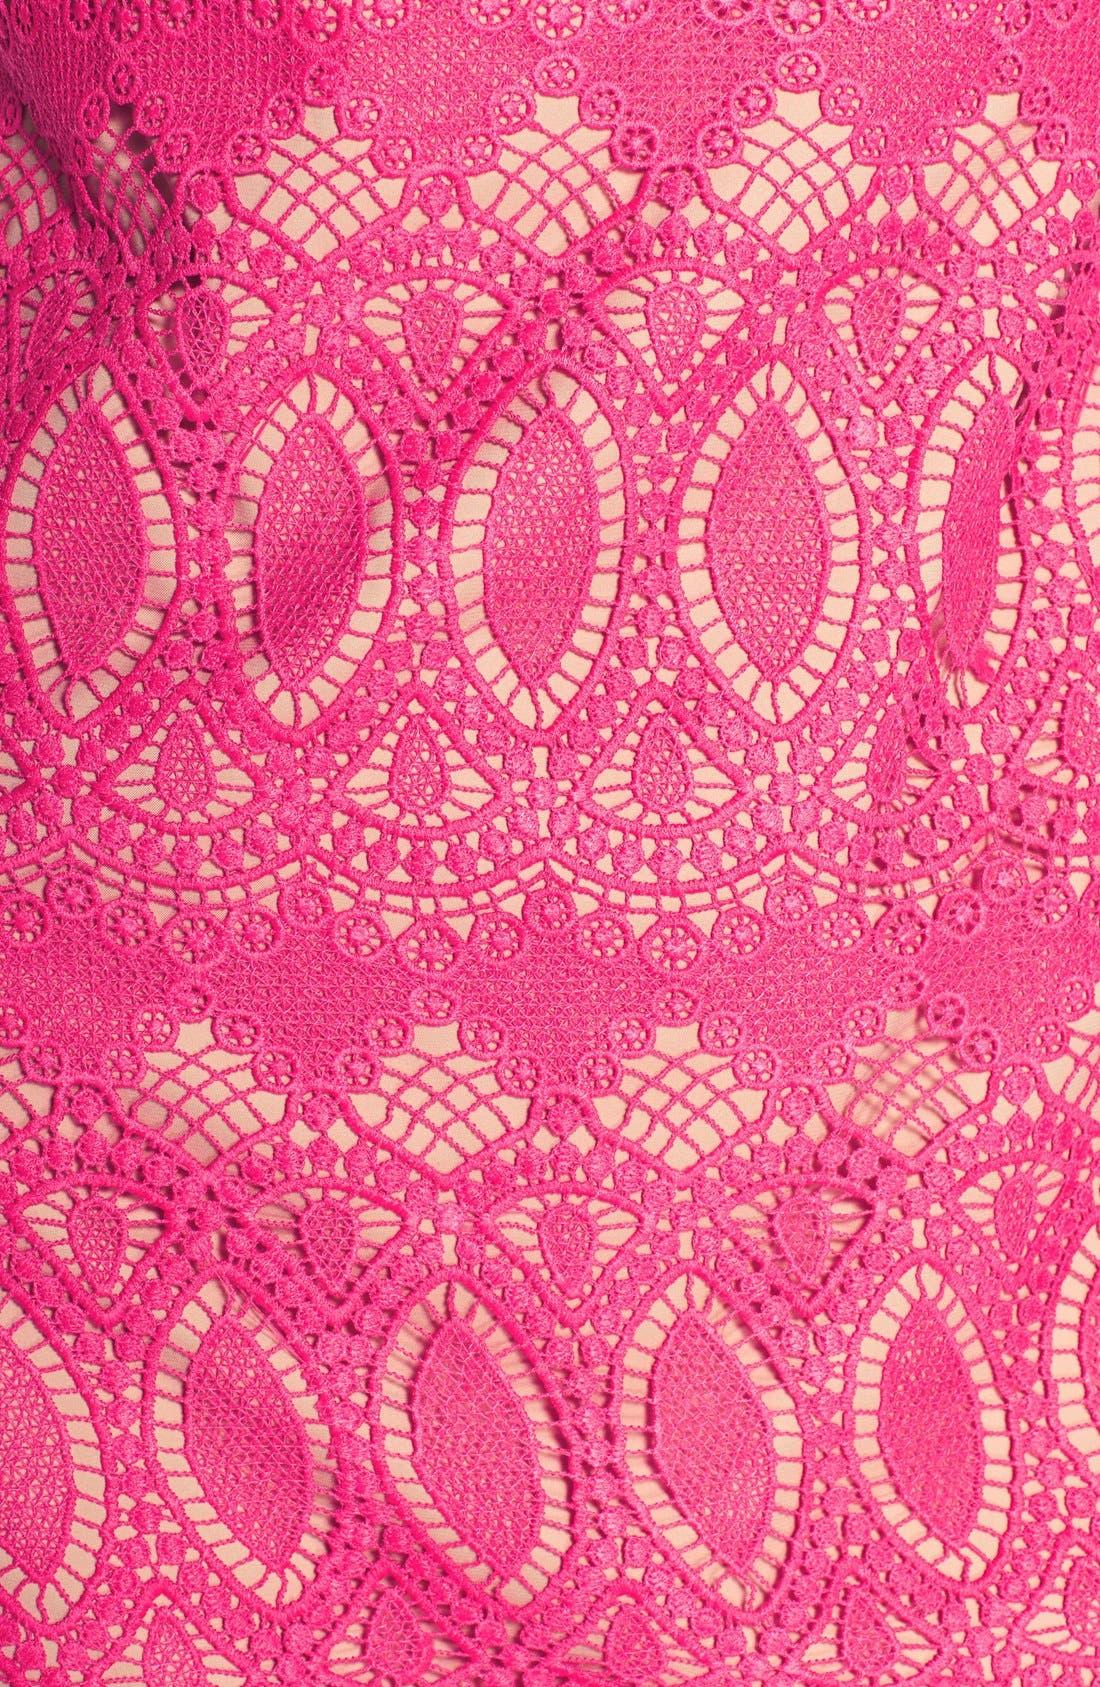 Scalloped Lace Sheath Dress,                             Alternate thumbnail 7, color,                             660